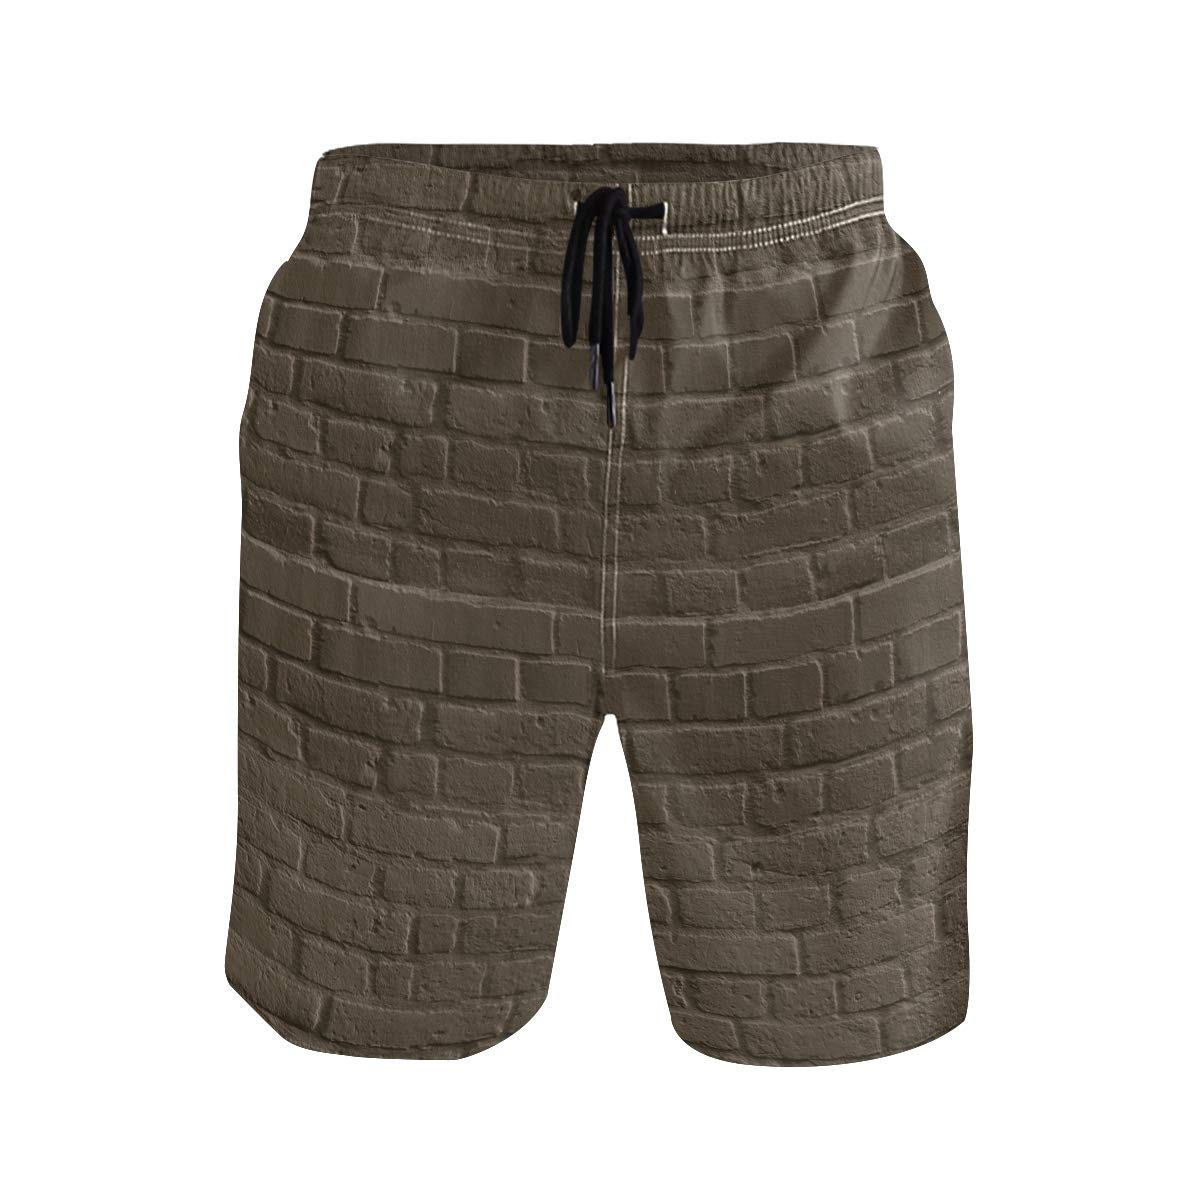 Mens Beach Swim Trunks Brick Wall Seamless Texture Boxer Swimsuit Underwear Board Shorts with Pocket